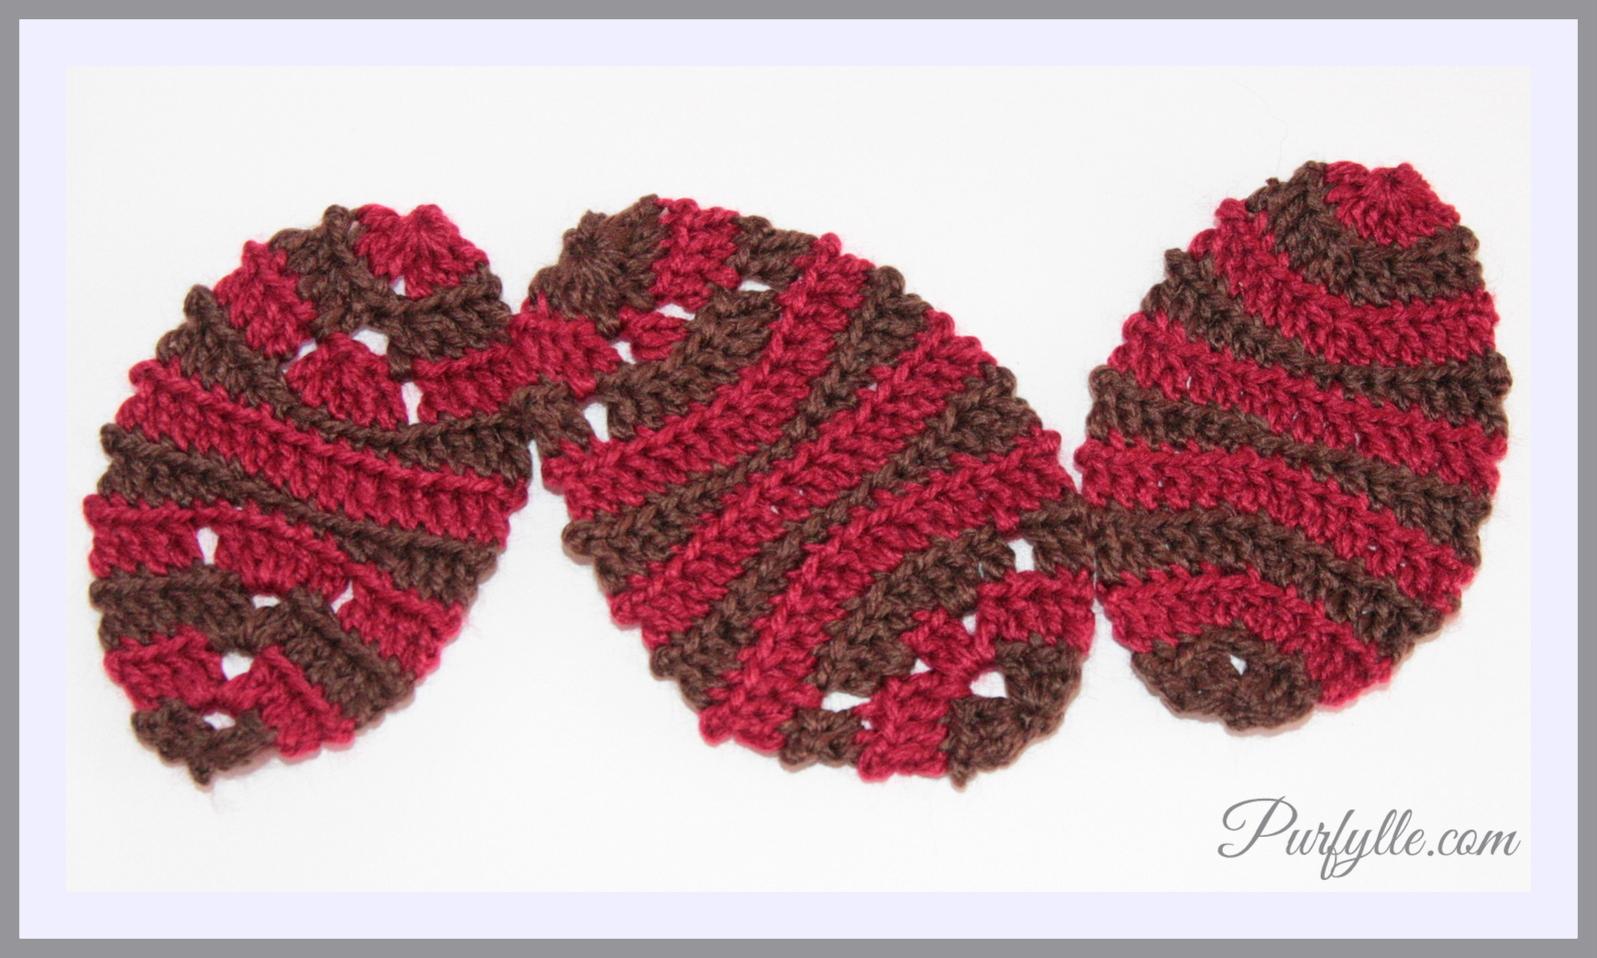 Purfylle: Crochet Patterns